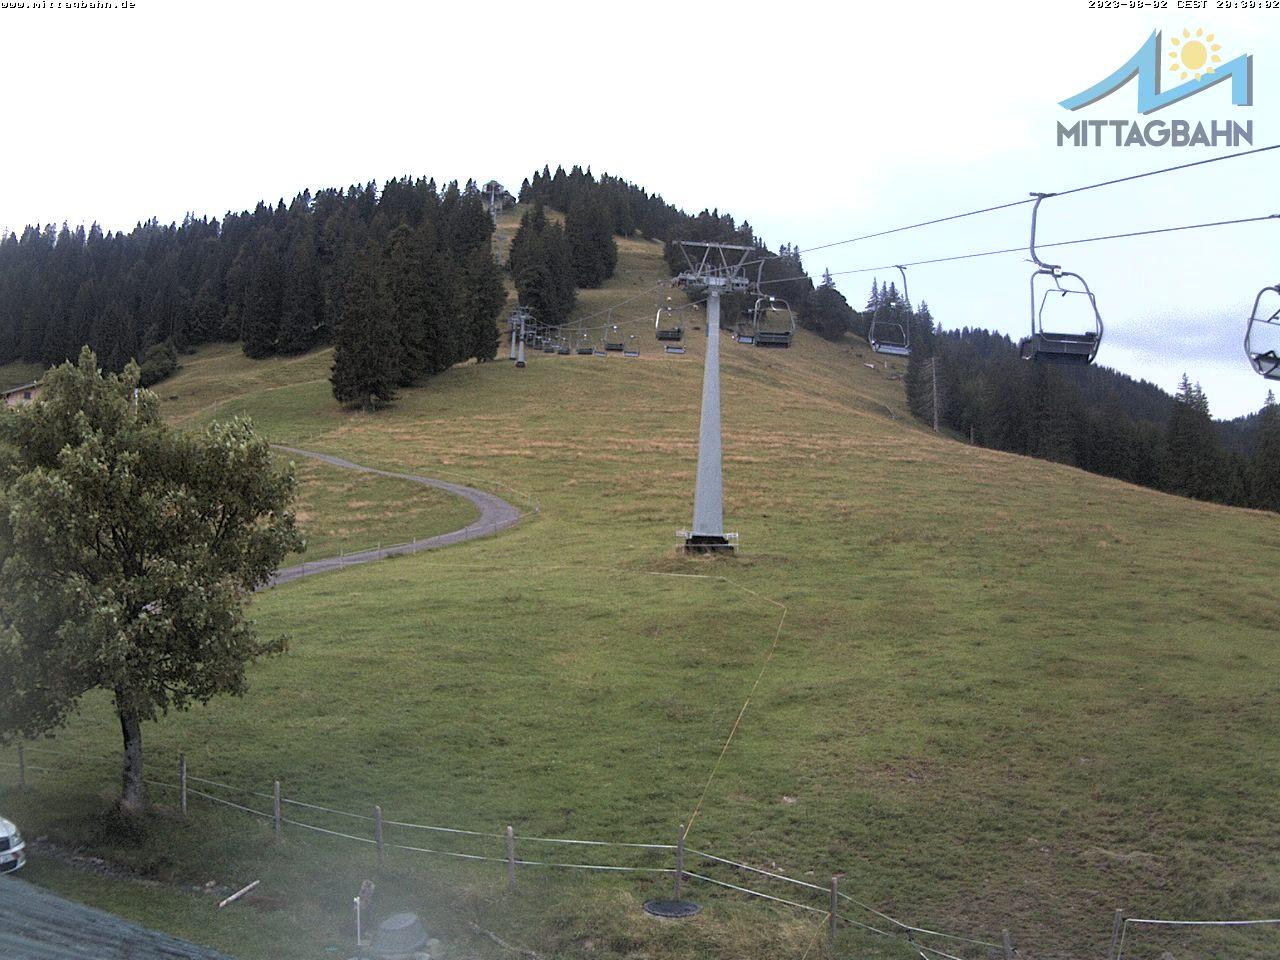 Webcam Ski Resort Immenstadt - Mittag cam 4 - Bavaria Alps - Allgäu